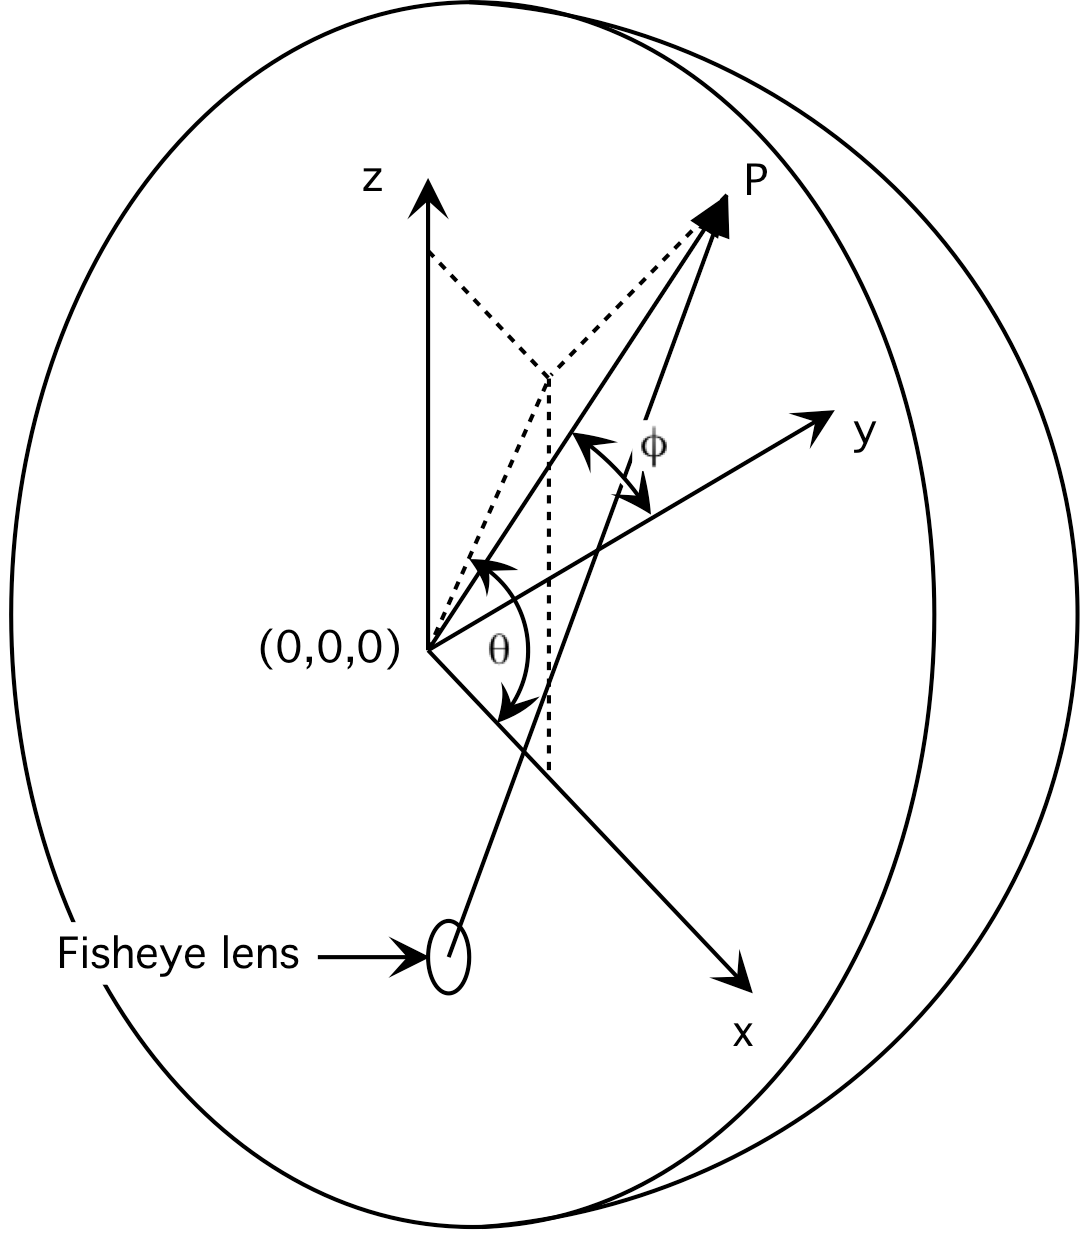 Image Warping For Offaxis Fisheye Lens Projectors